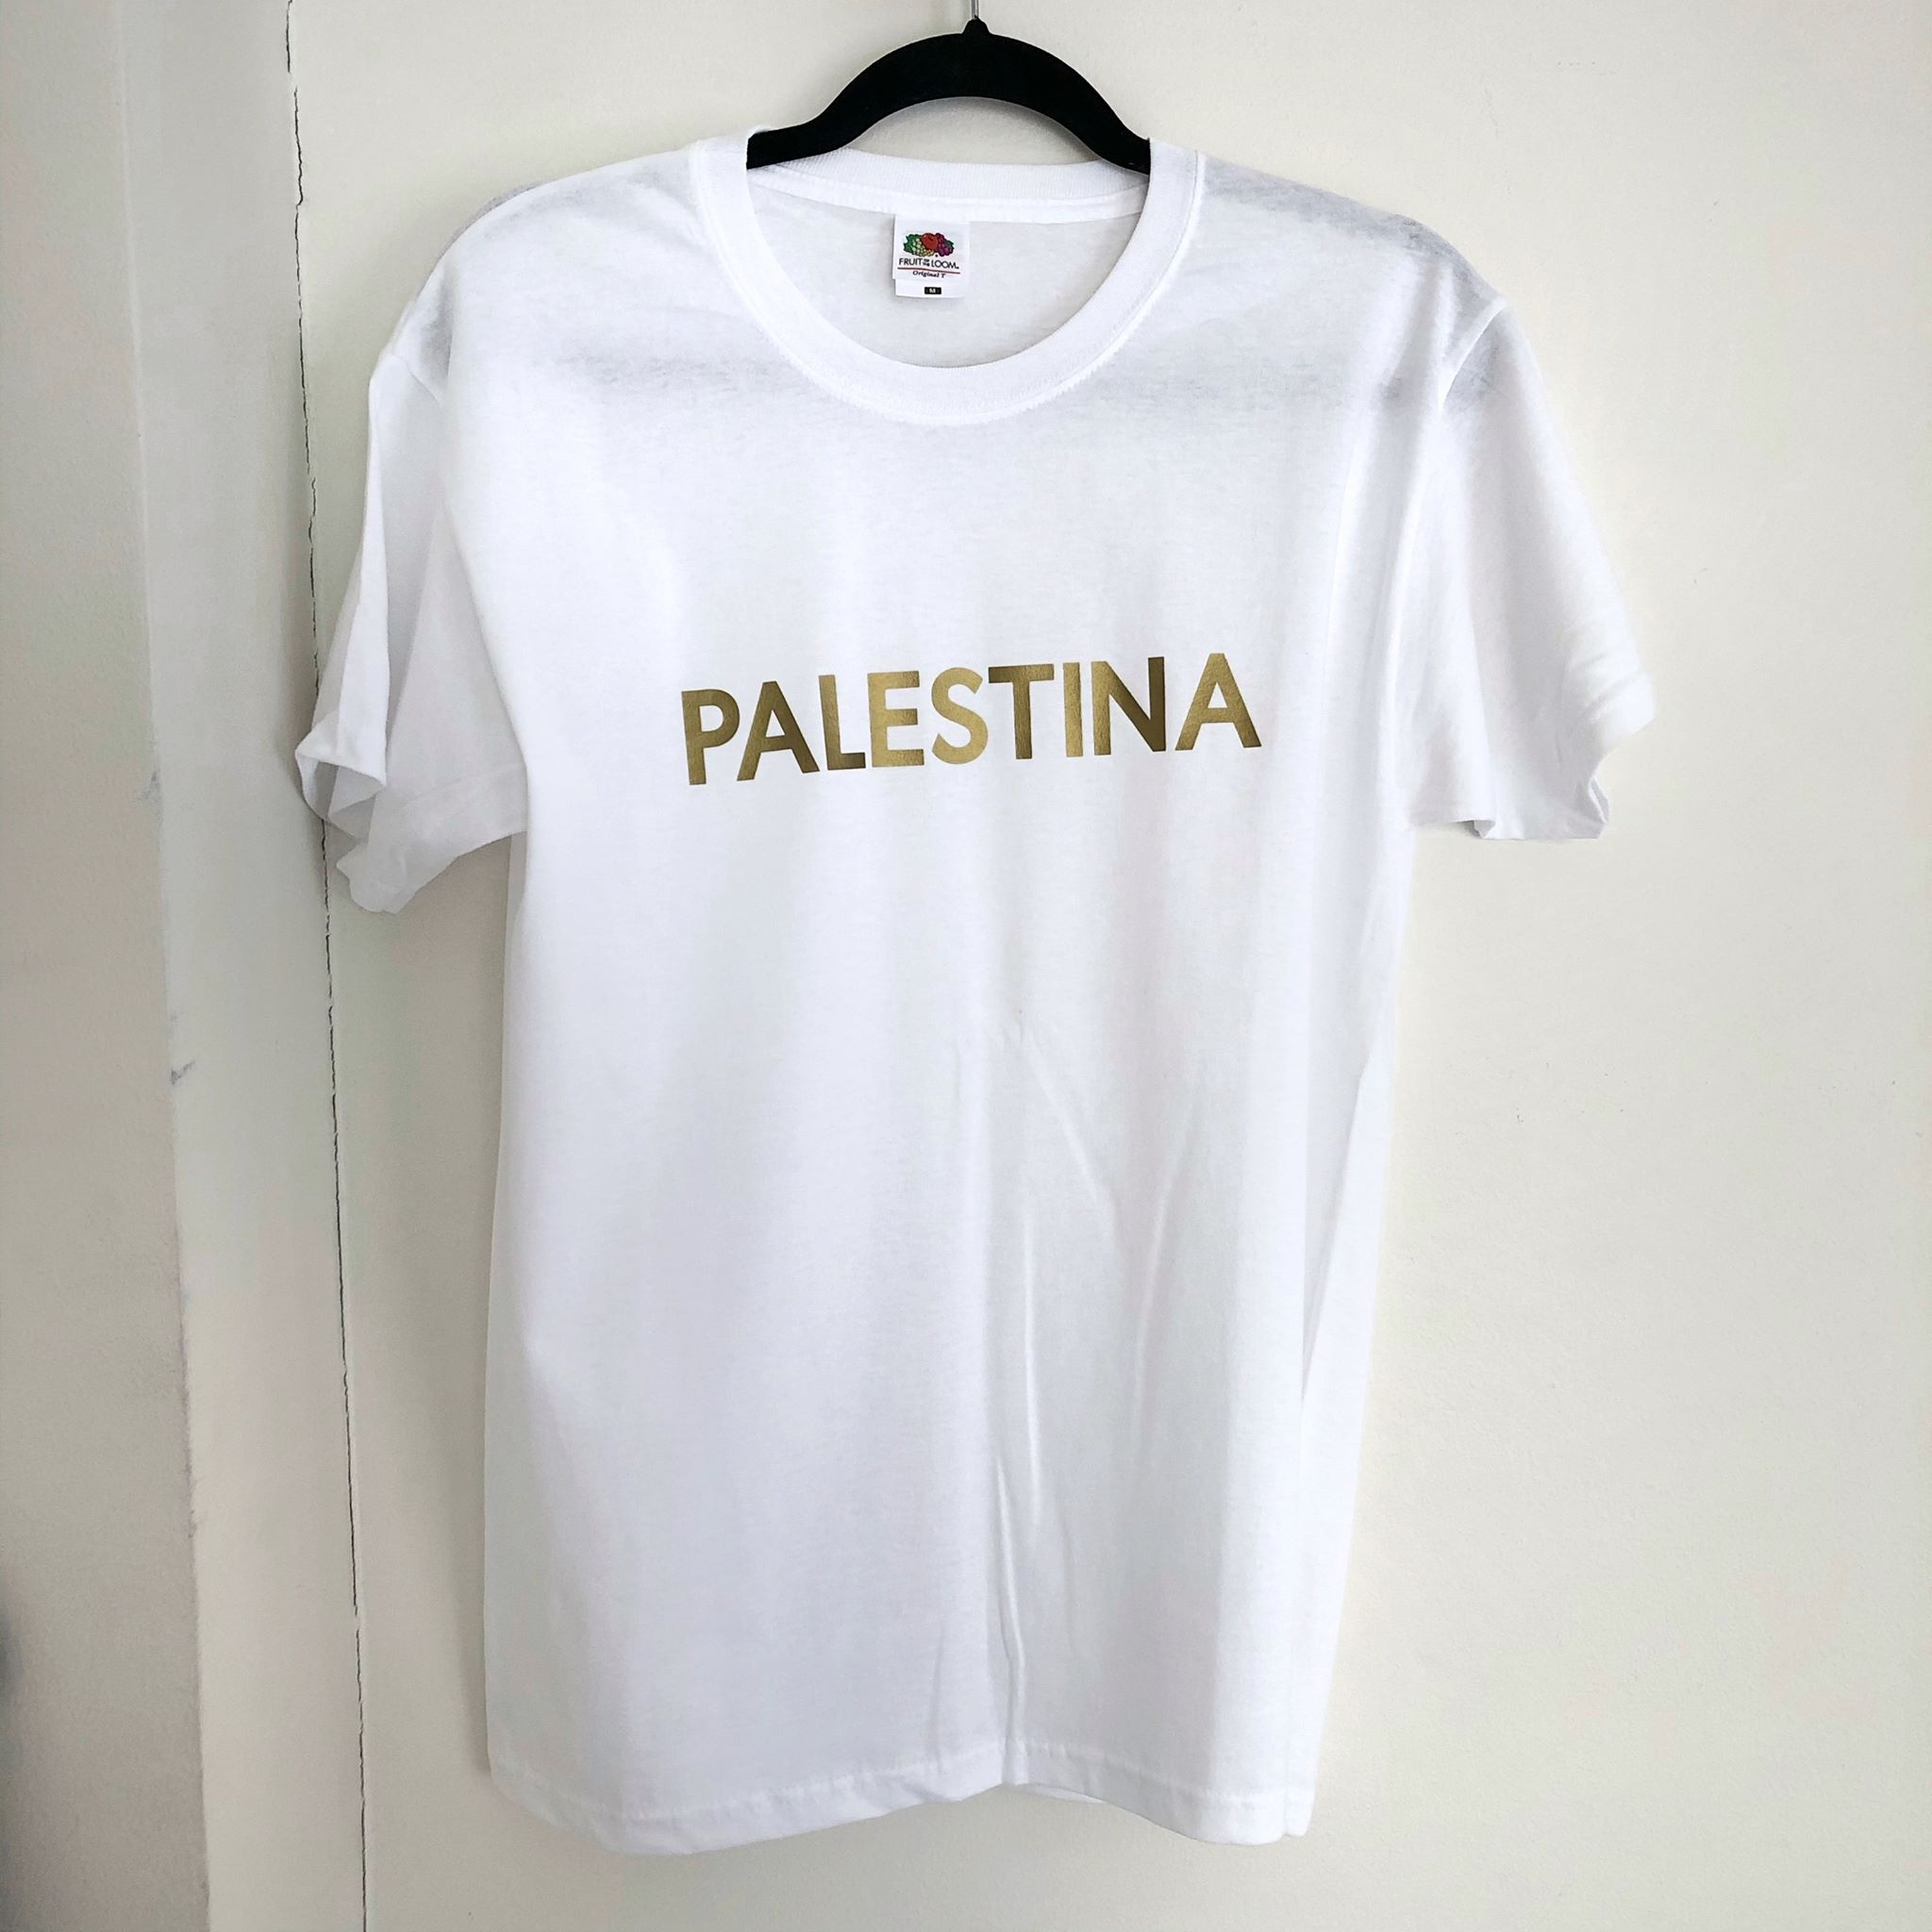 T-skjorte - PALESTINA, hvit